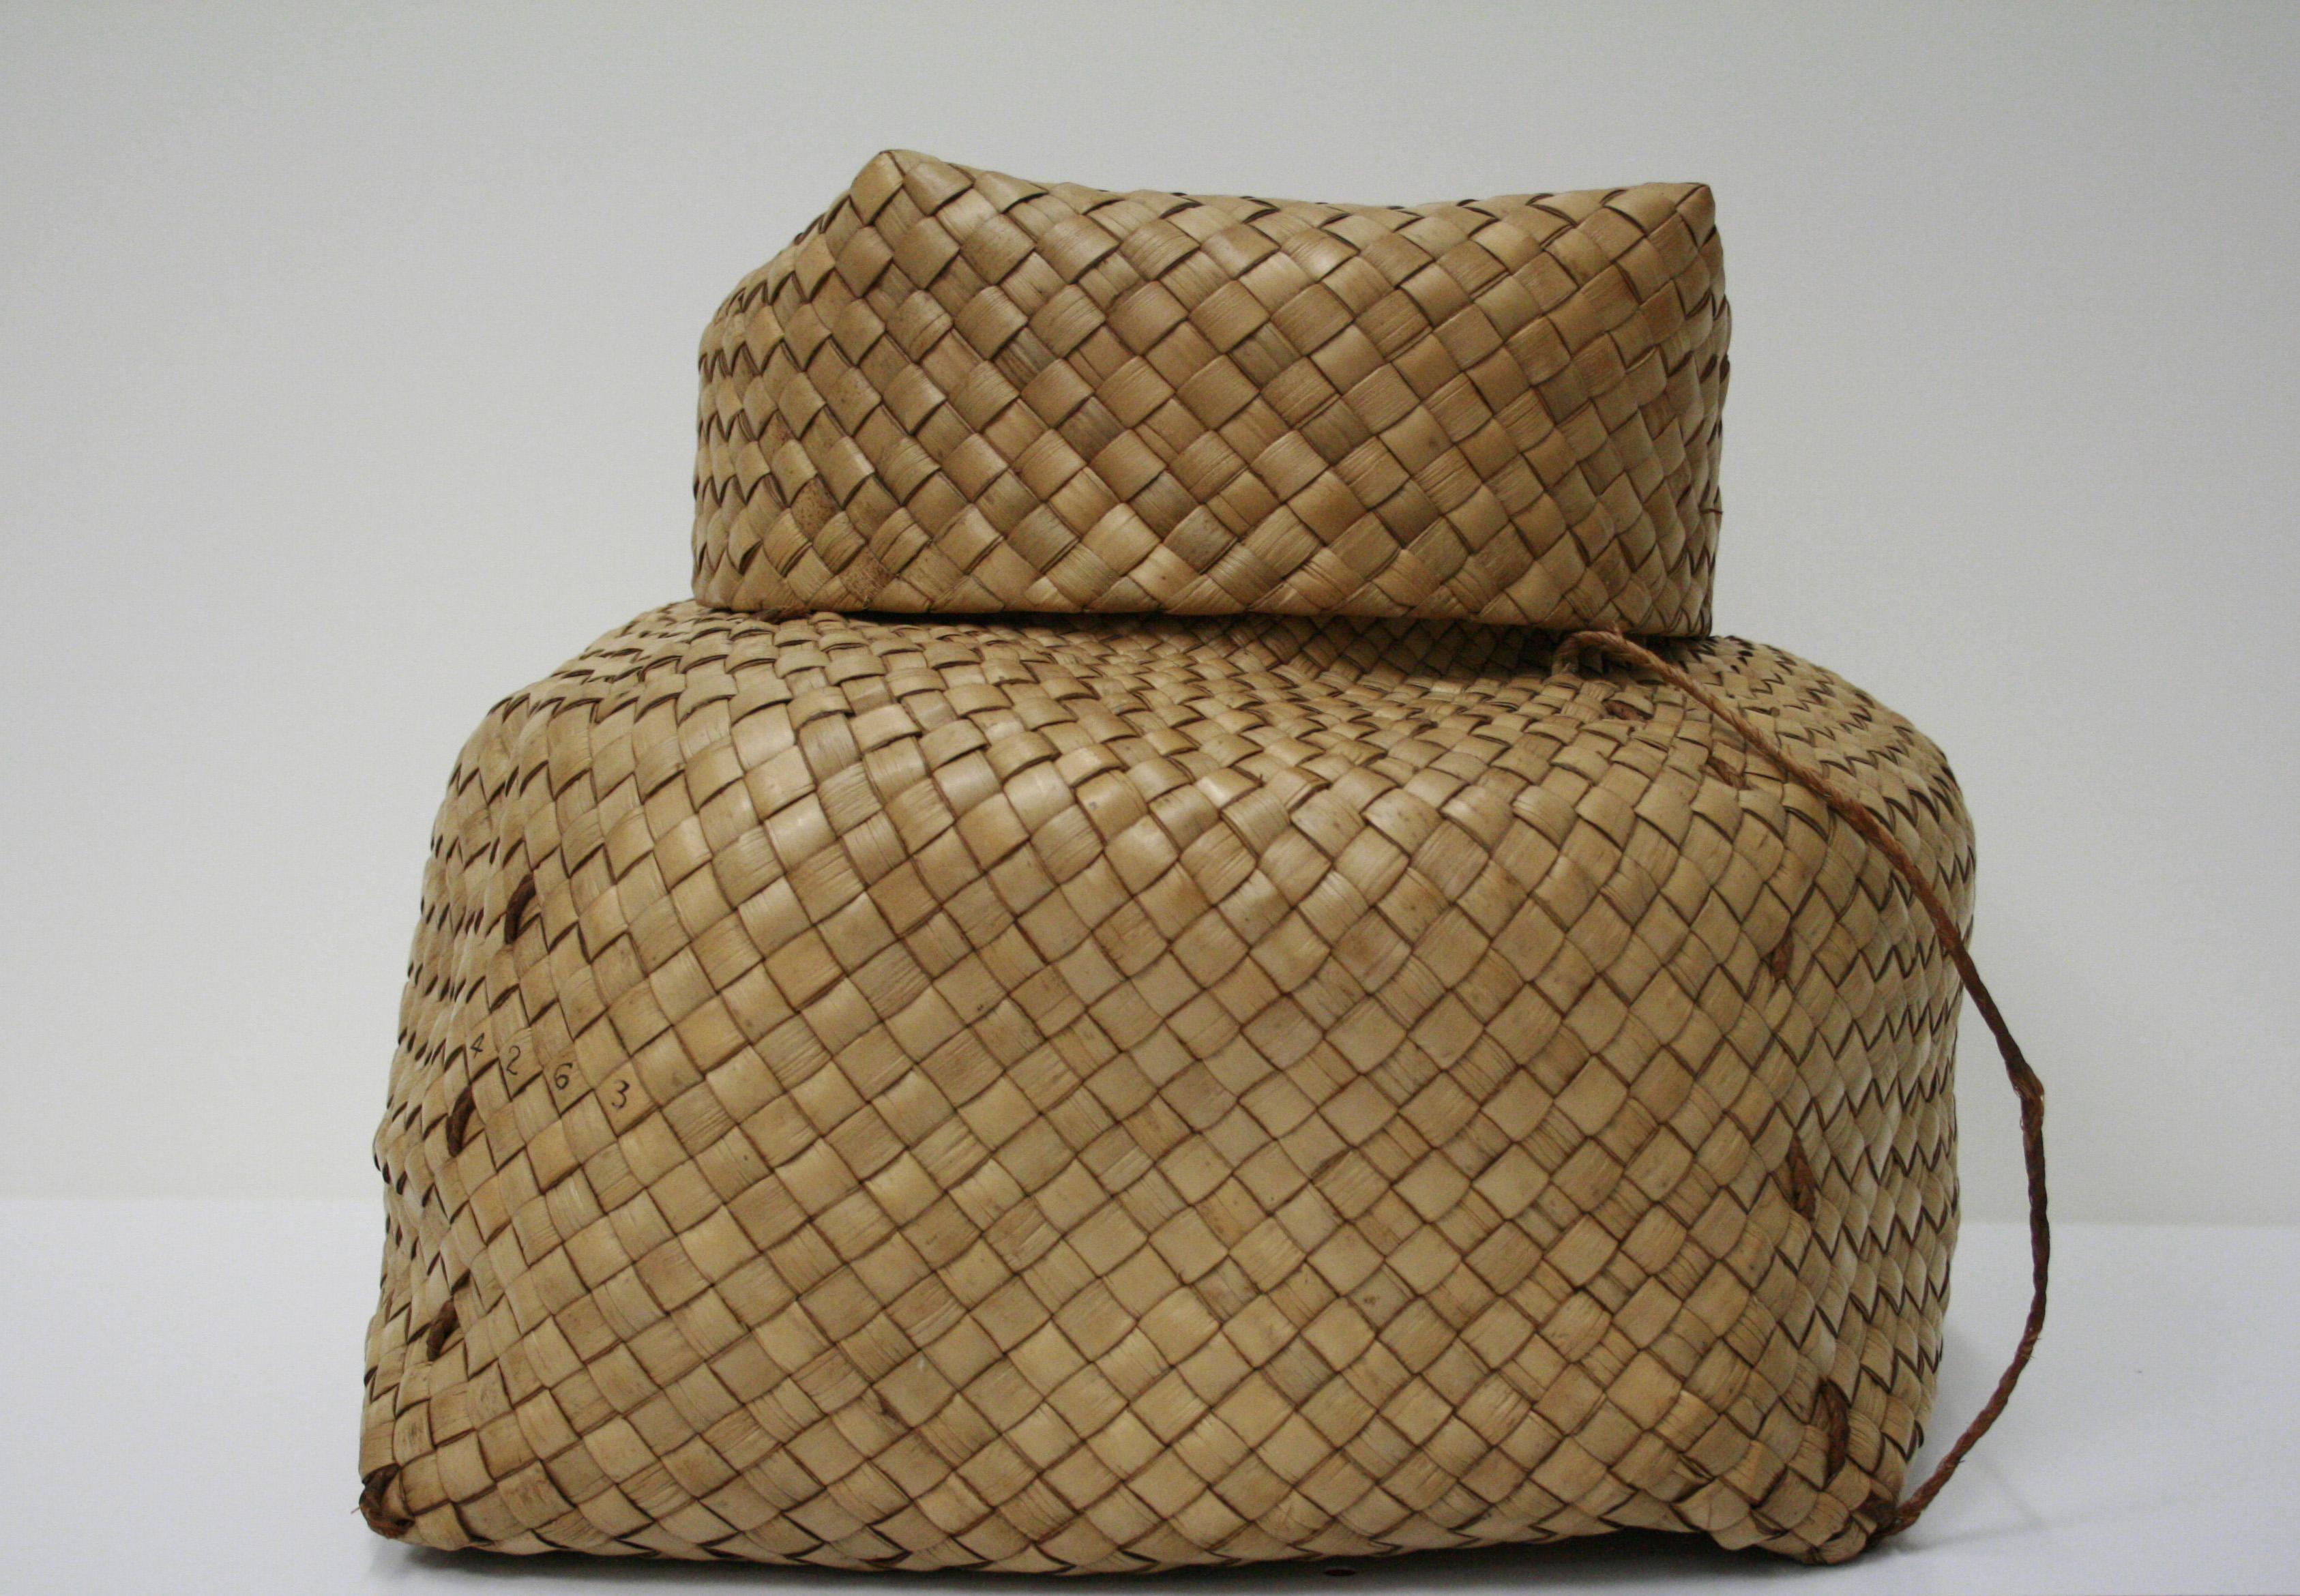 Exhibit Nani I Ka Lau Lau Hala Weaving in Hawaii & Ho Mai Ka Hala Bring Forth the Hala (2) (1)